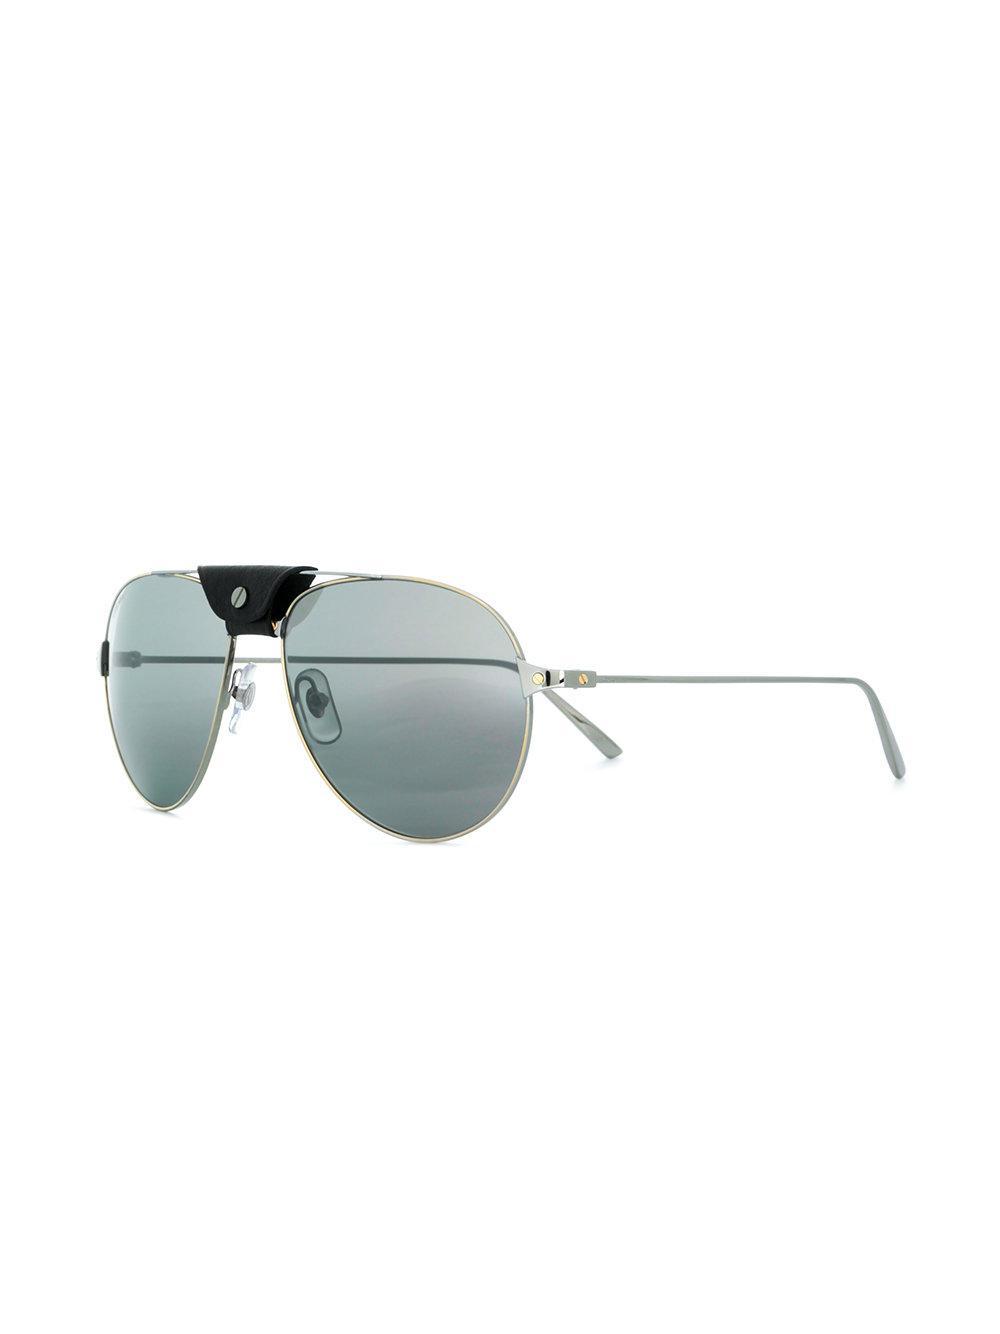 91248e8644ab Cartier Santos De Sunglasses in Metallic for Men - Lyst